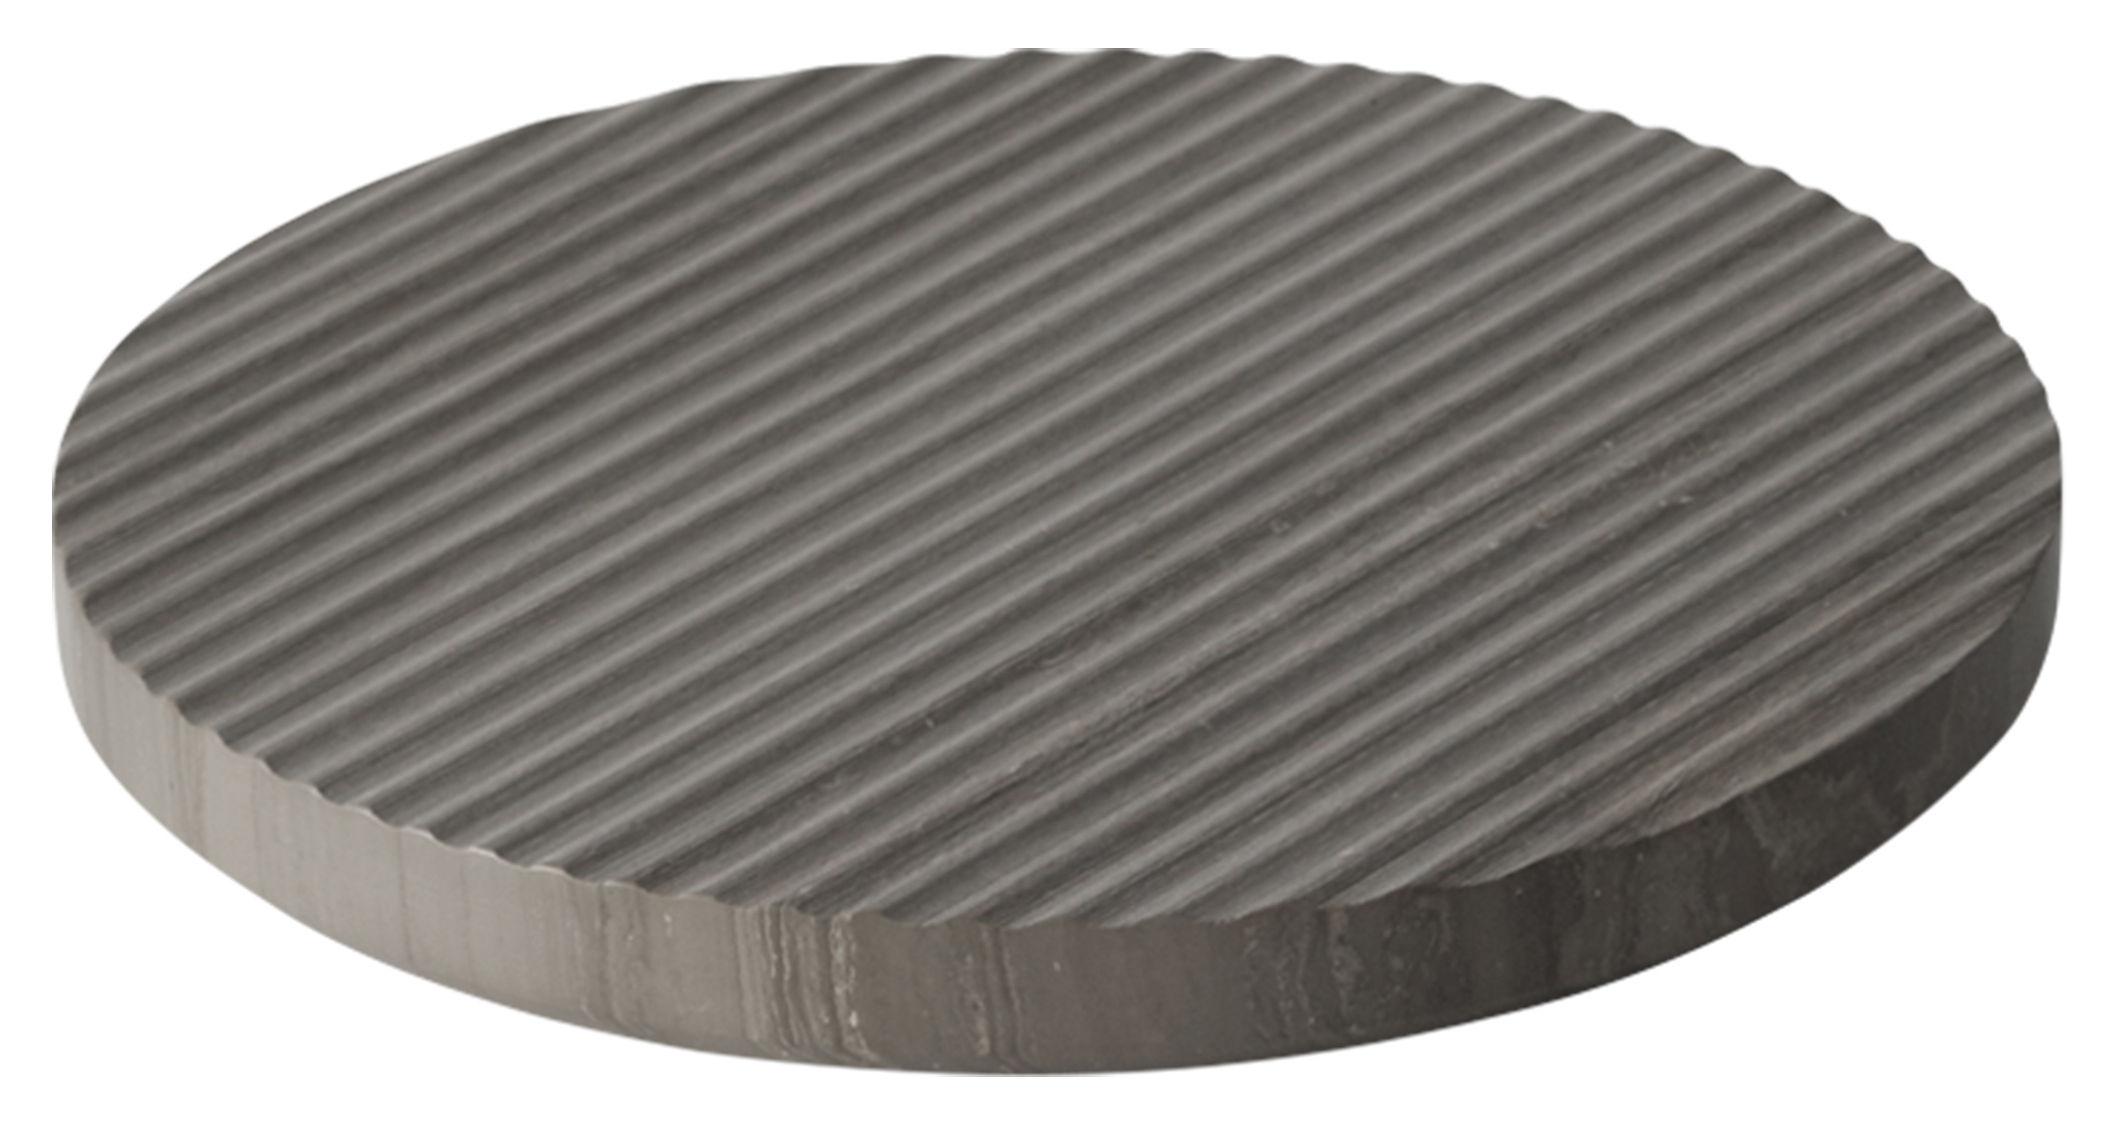 Tischkultur - Topfuntersetzer - Groove Topfuntersetzer / groß Ø 21,6 cm - Marmor - Muuto - Grau - Marmor